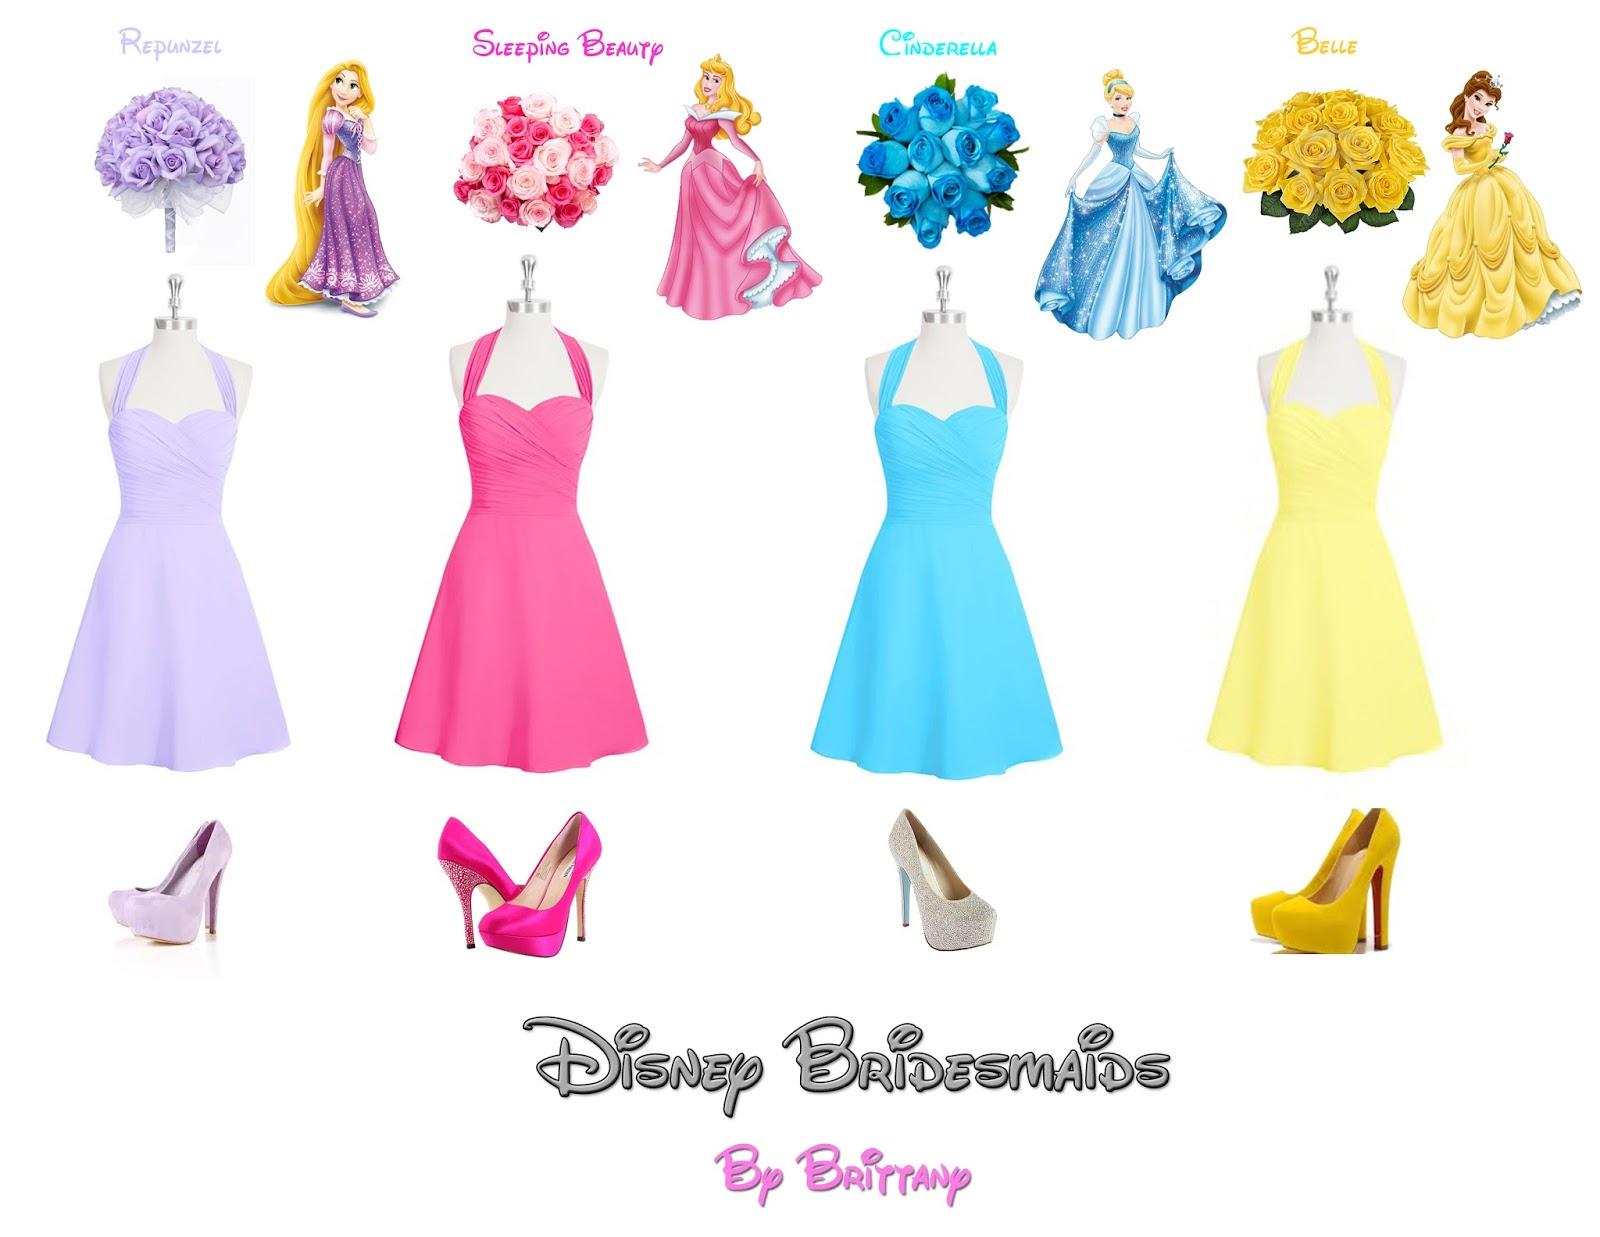 Disney Princess Bridesmaid Dresses